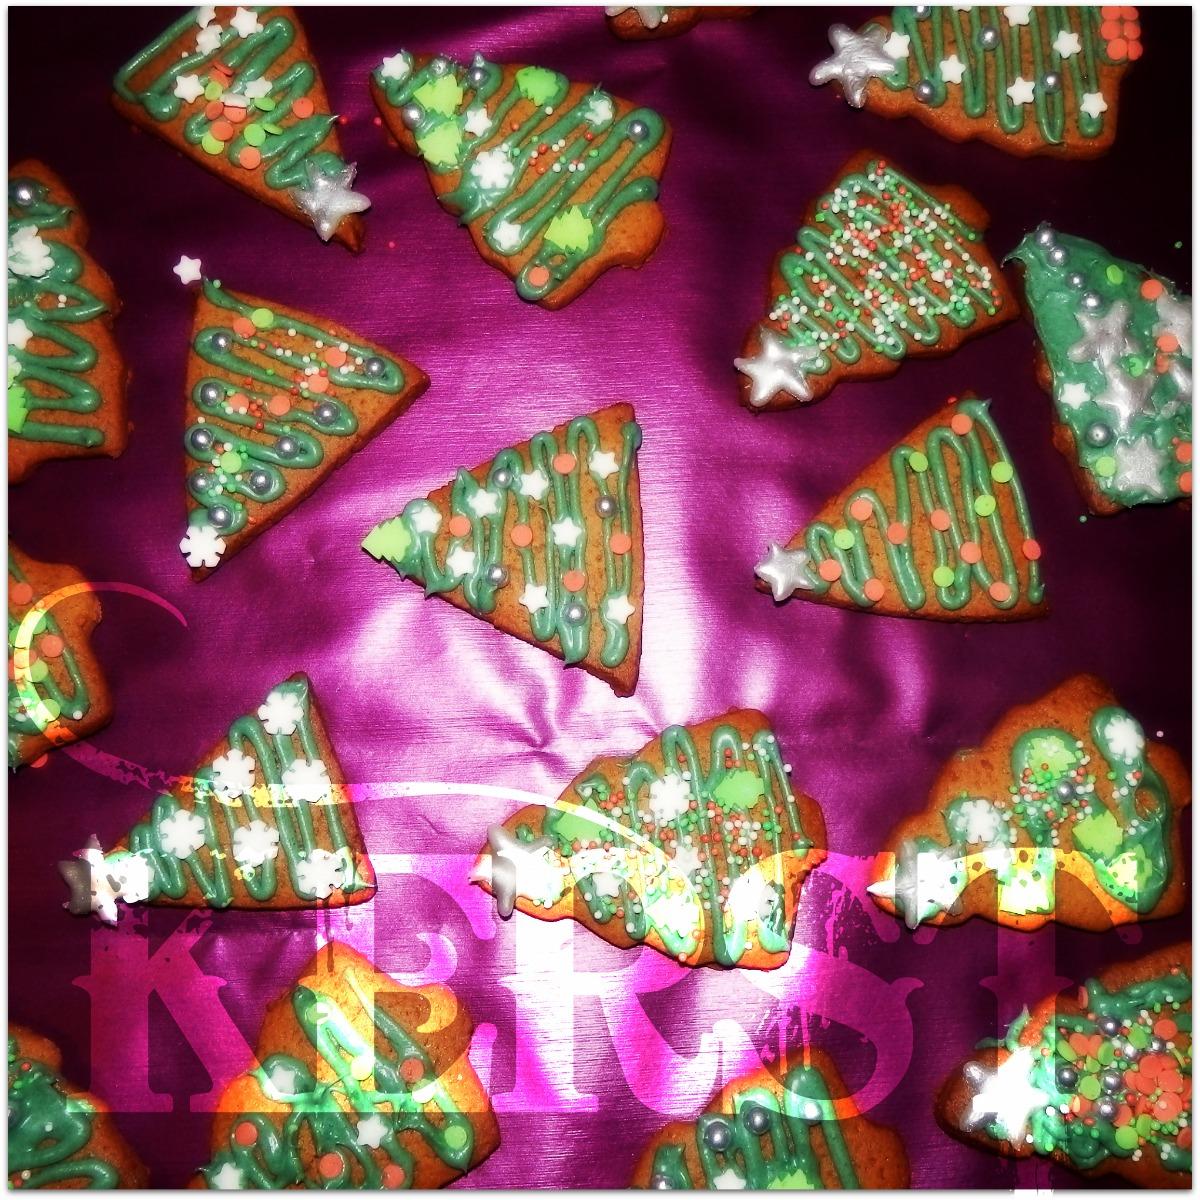 Kerstkoekjes kerstboom